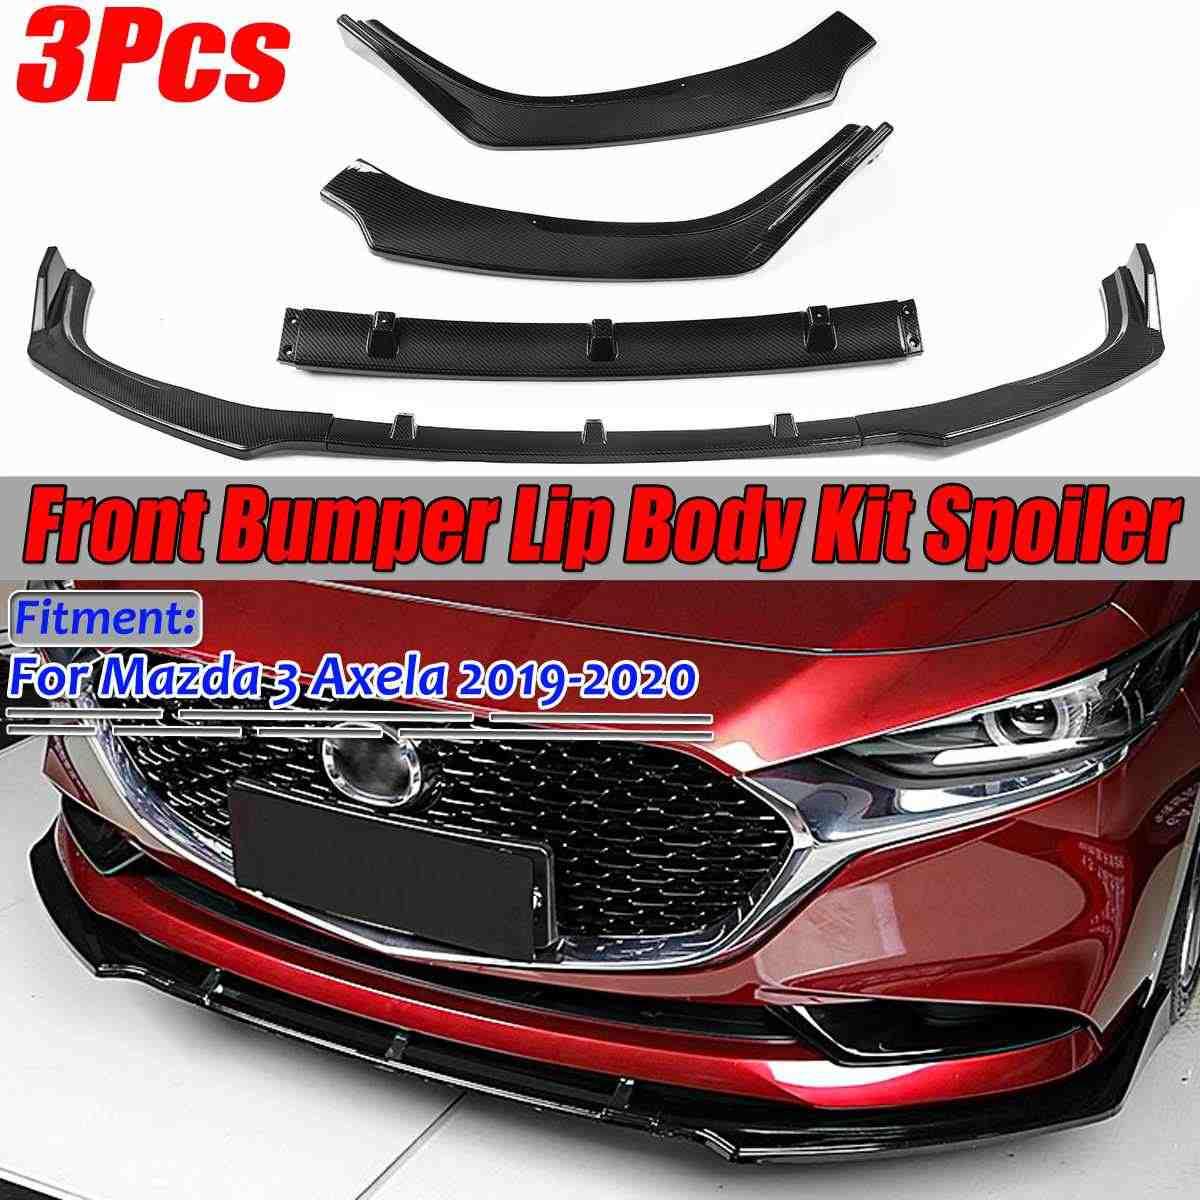 DSEB Difusor Spoiler Black//Carbon Look Front Lip Dipitter Splitter Kit De Cuerpo para Mazda 3 Limousine Axela 2019-2020,Glossy Black